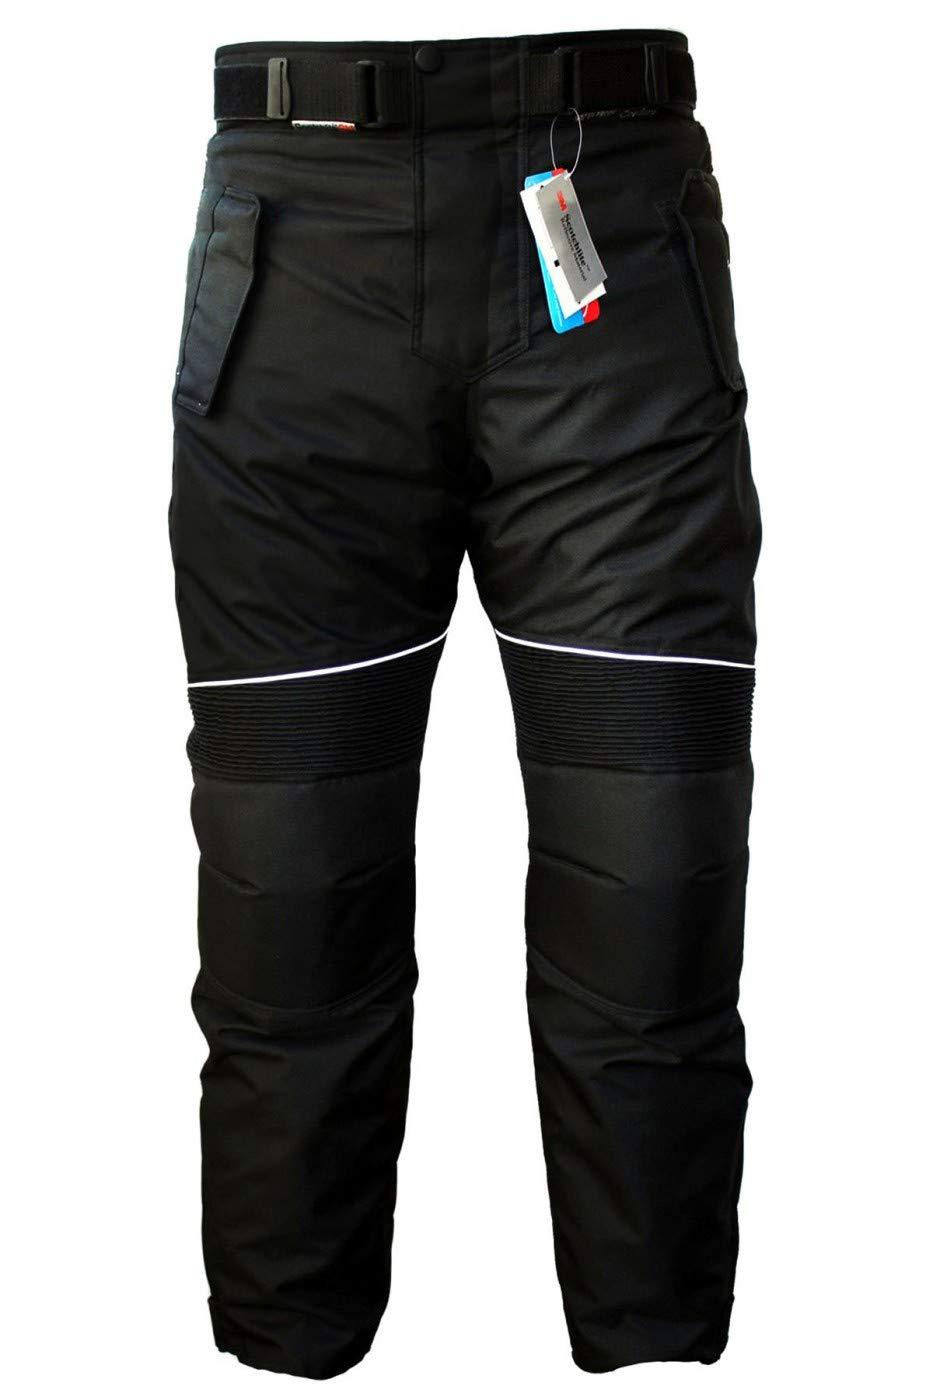 German Wear - Pantaloni da Uomo per Moto Cordura, Nero, 54 EU GW350T Schwarz 54